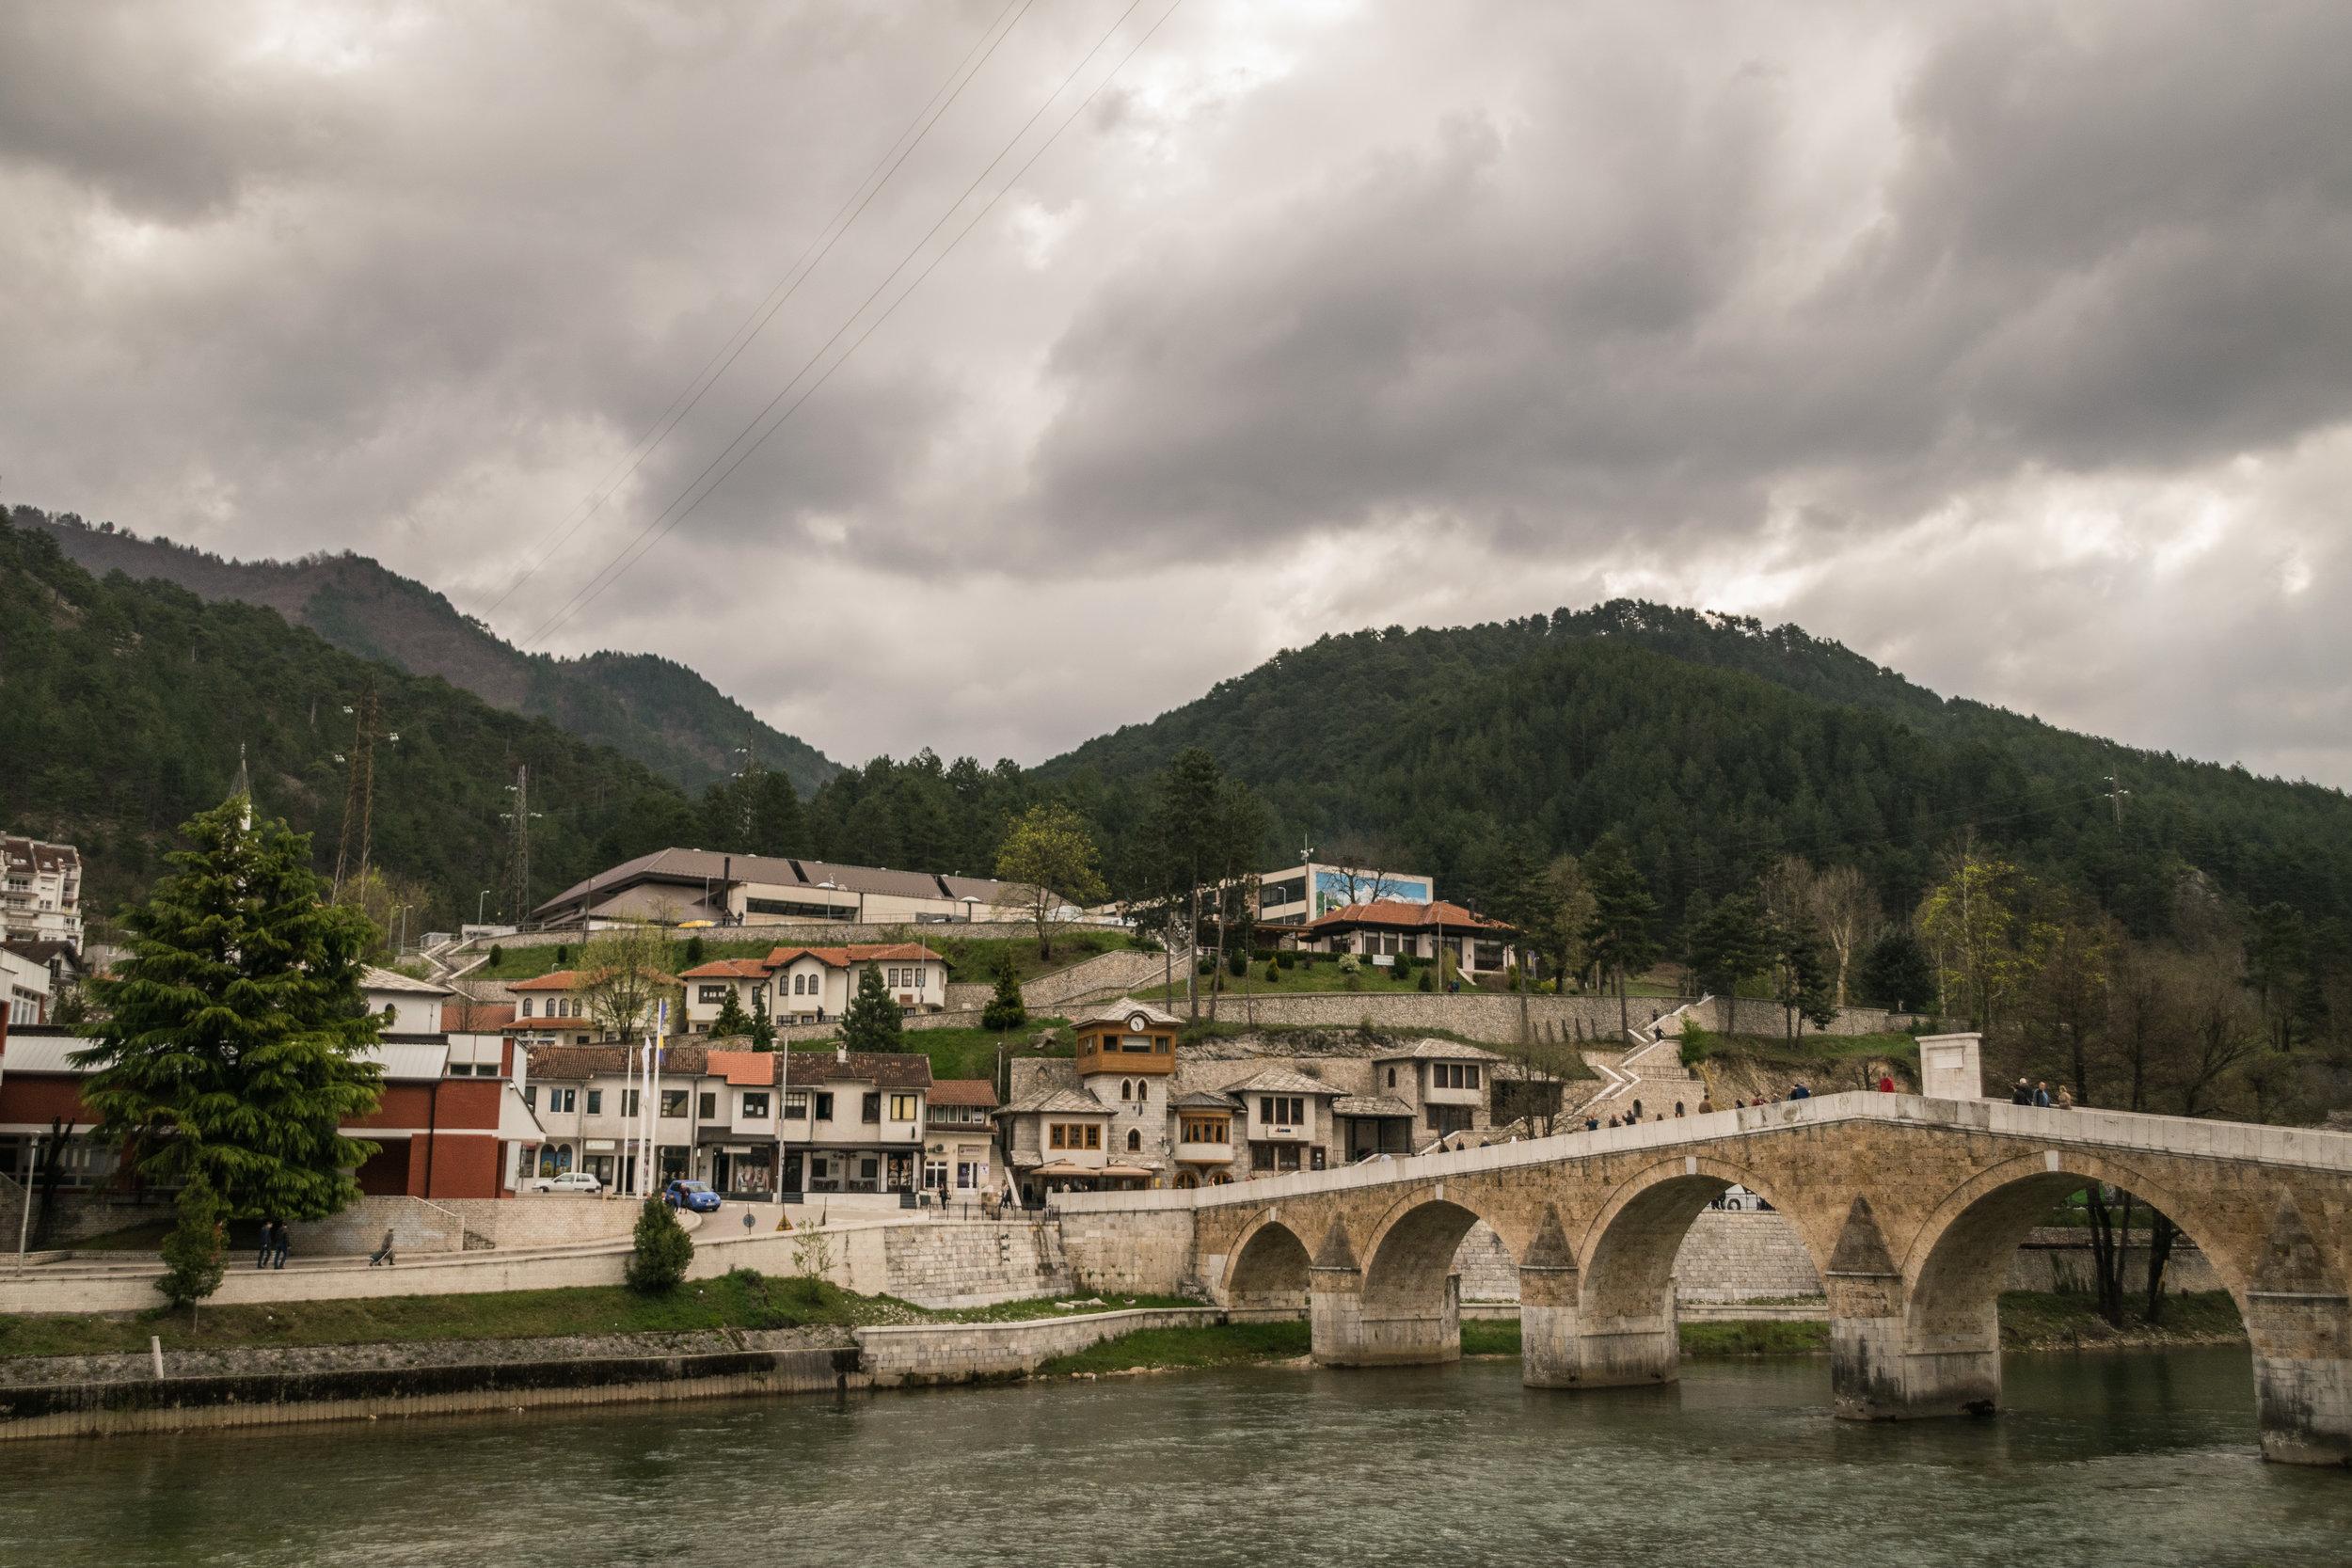 old stone bridge built in the 1600s